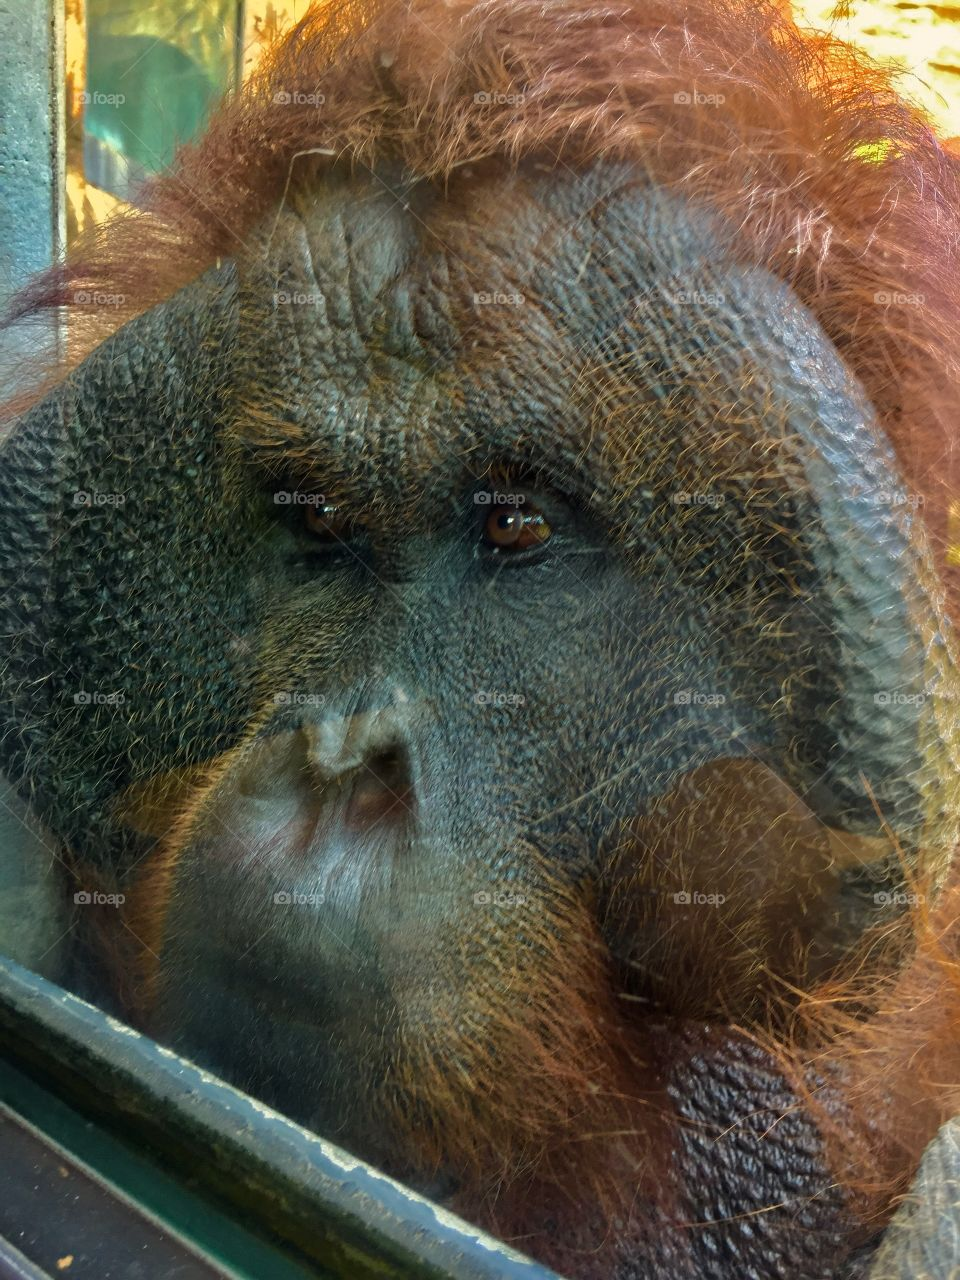 Come Here.  Tama Zoological Park. Tama, Japan